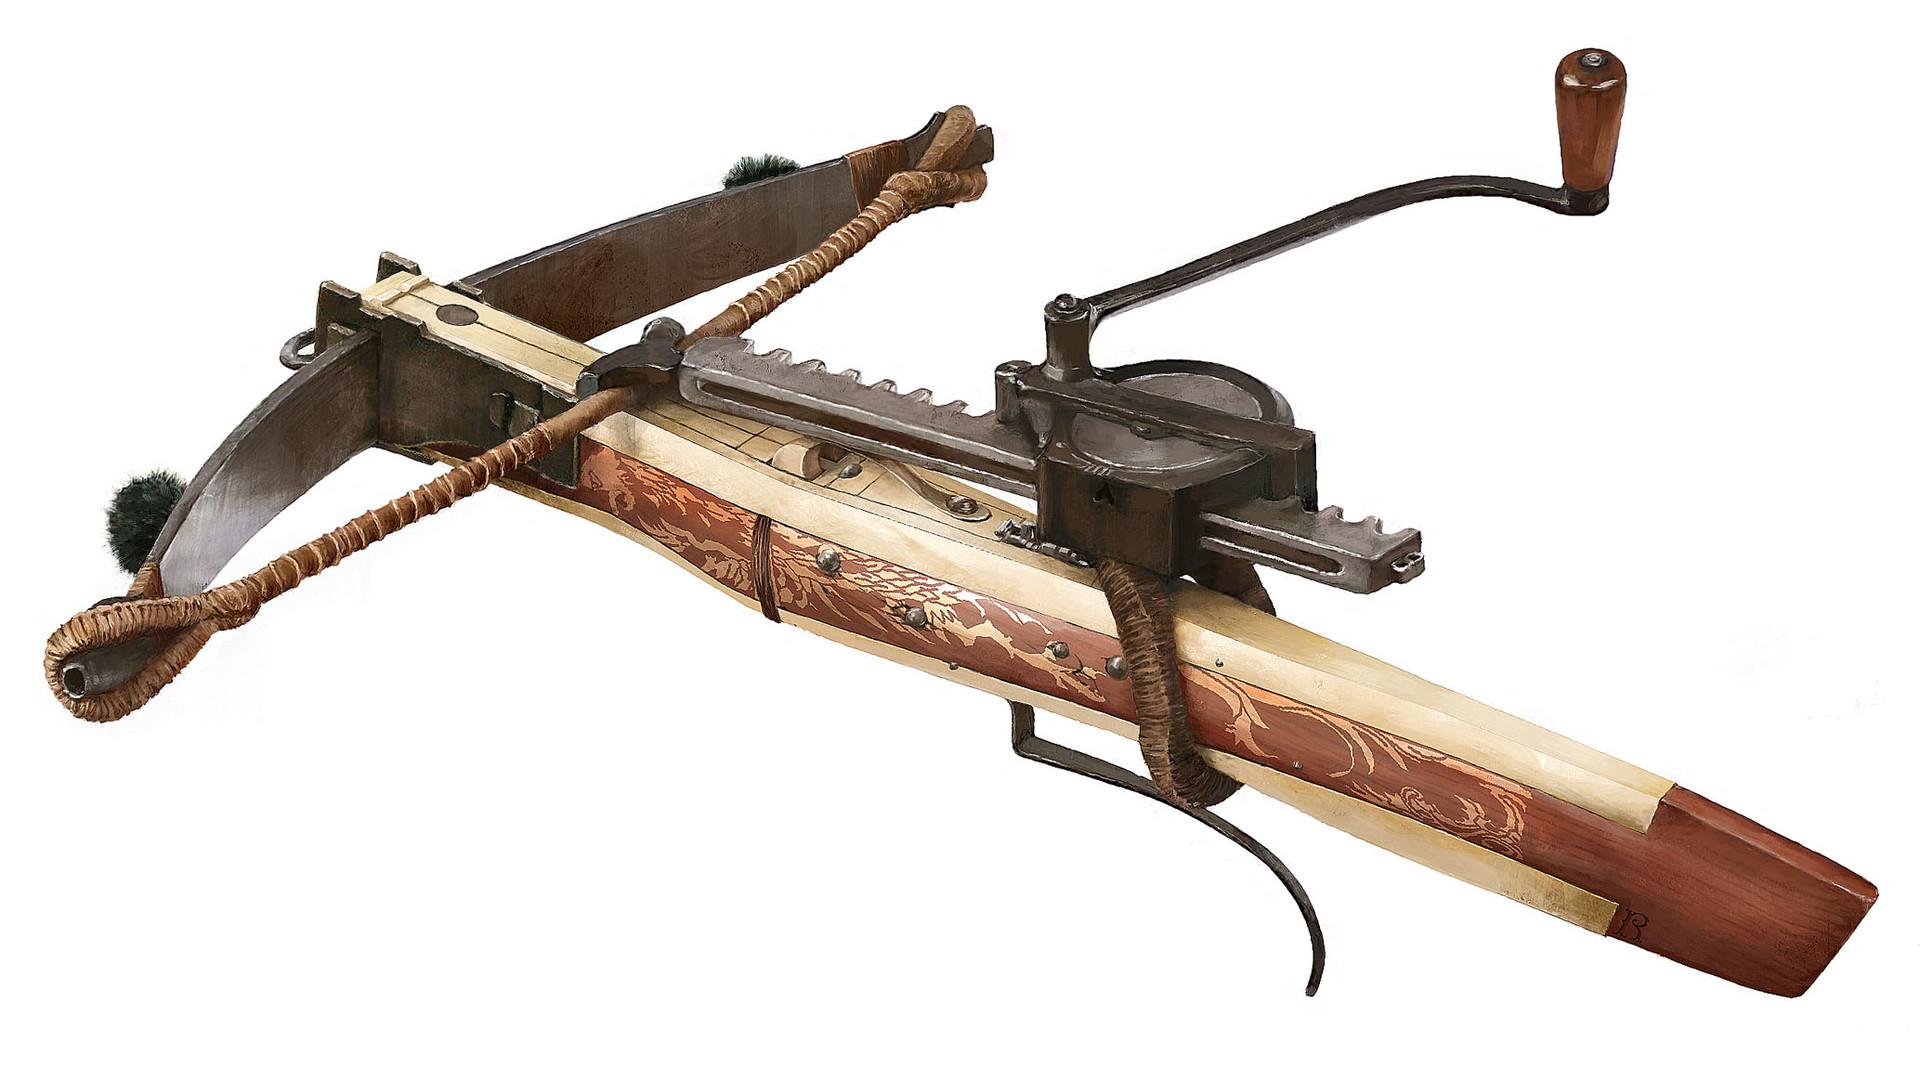 Rocio espin pinar medieval crossbow